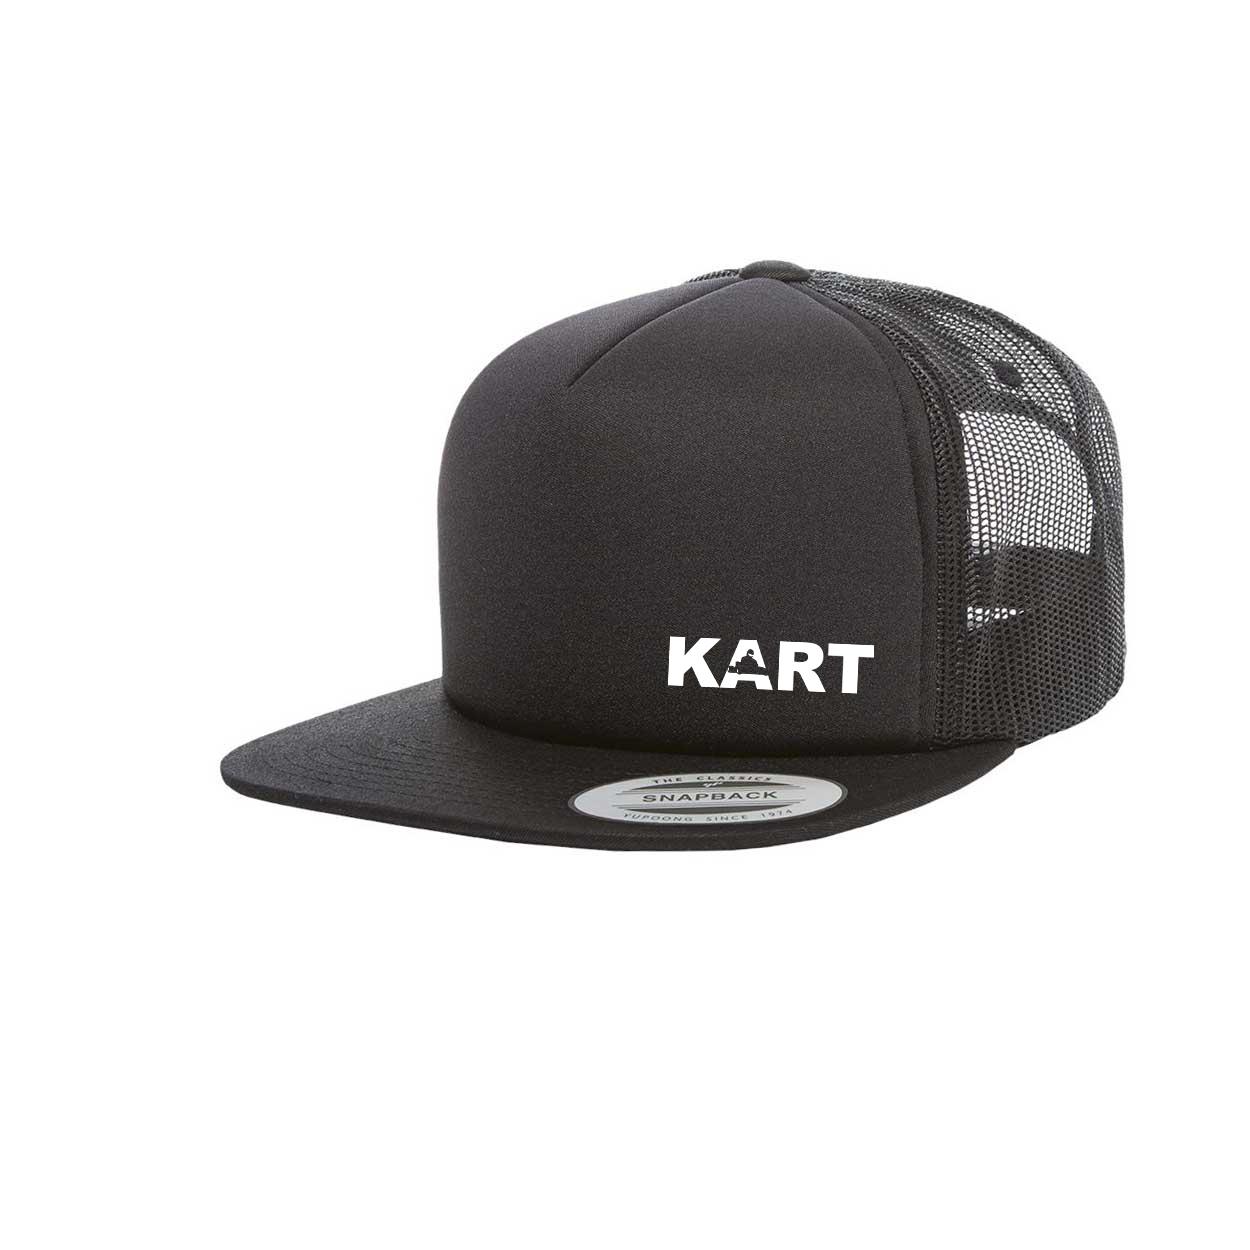 Kart Racer Logo Night Out Premium Foam Flat Brim Snapback Hat Black (White Logo)